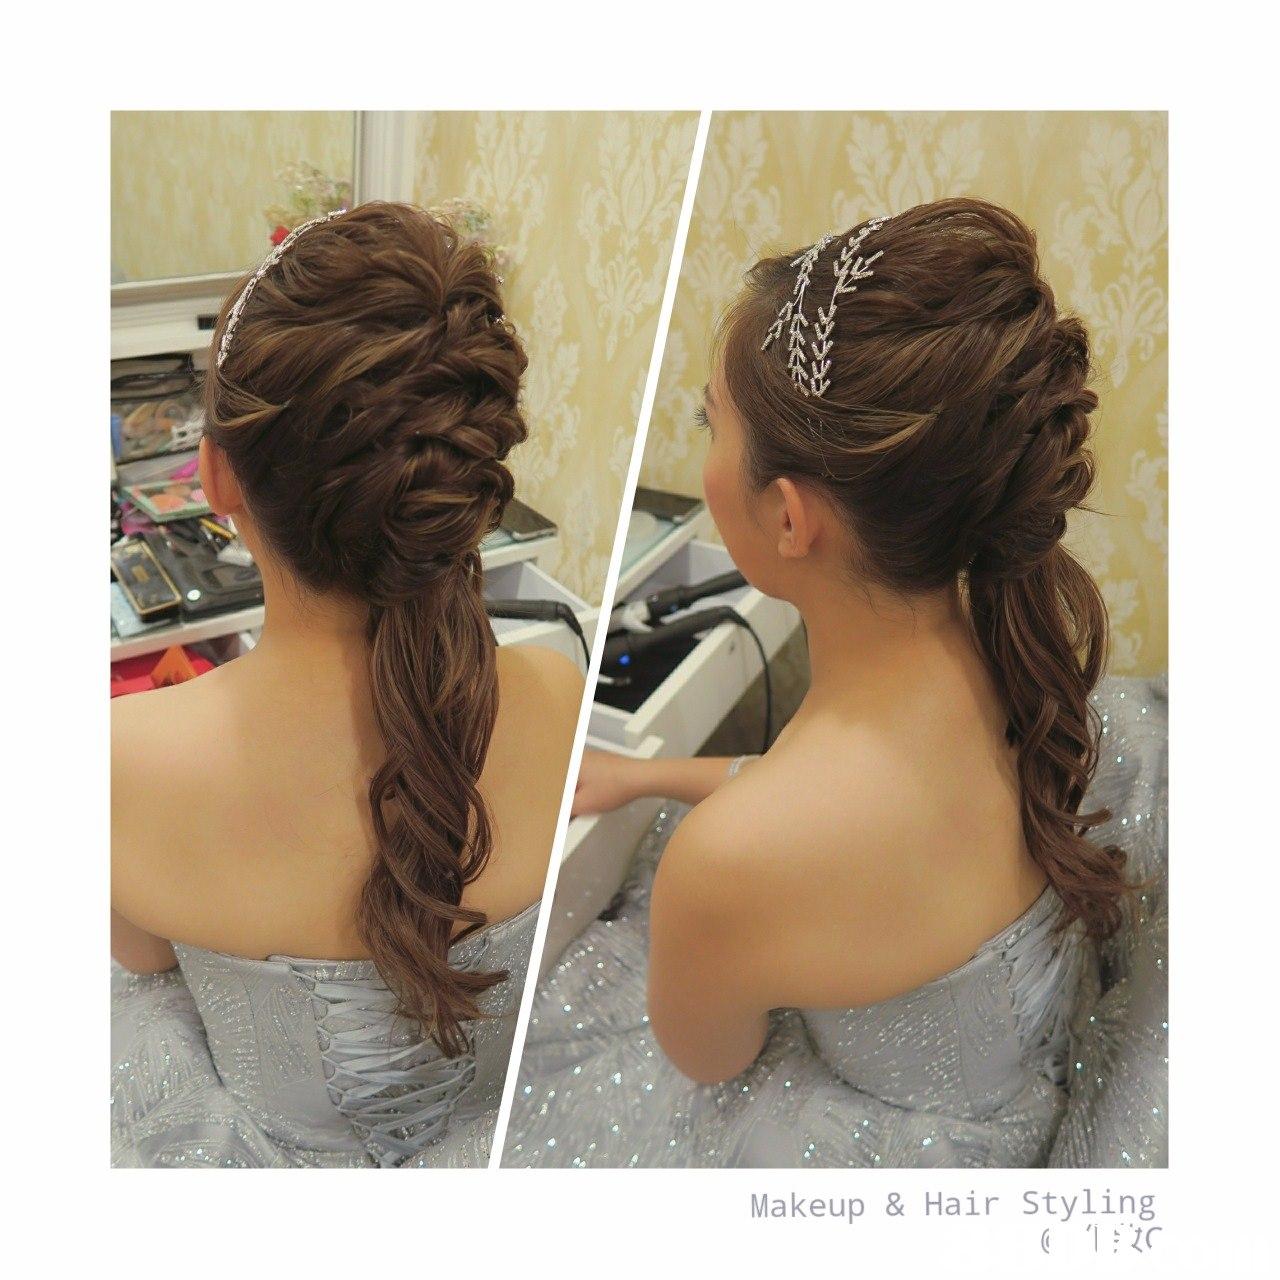 Makeup &Hair Styling,hair,hairstyle,chignon,long hair,bun